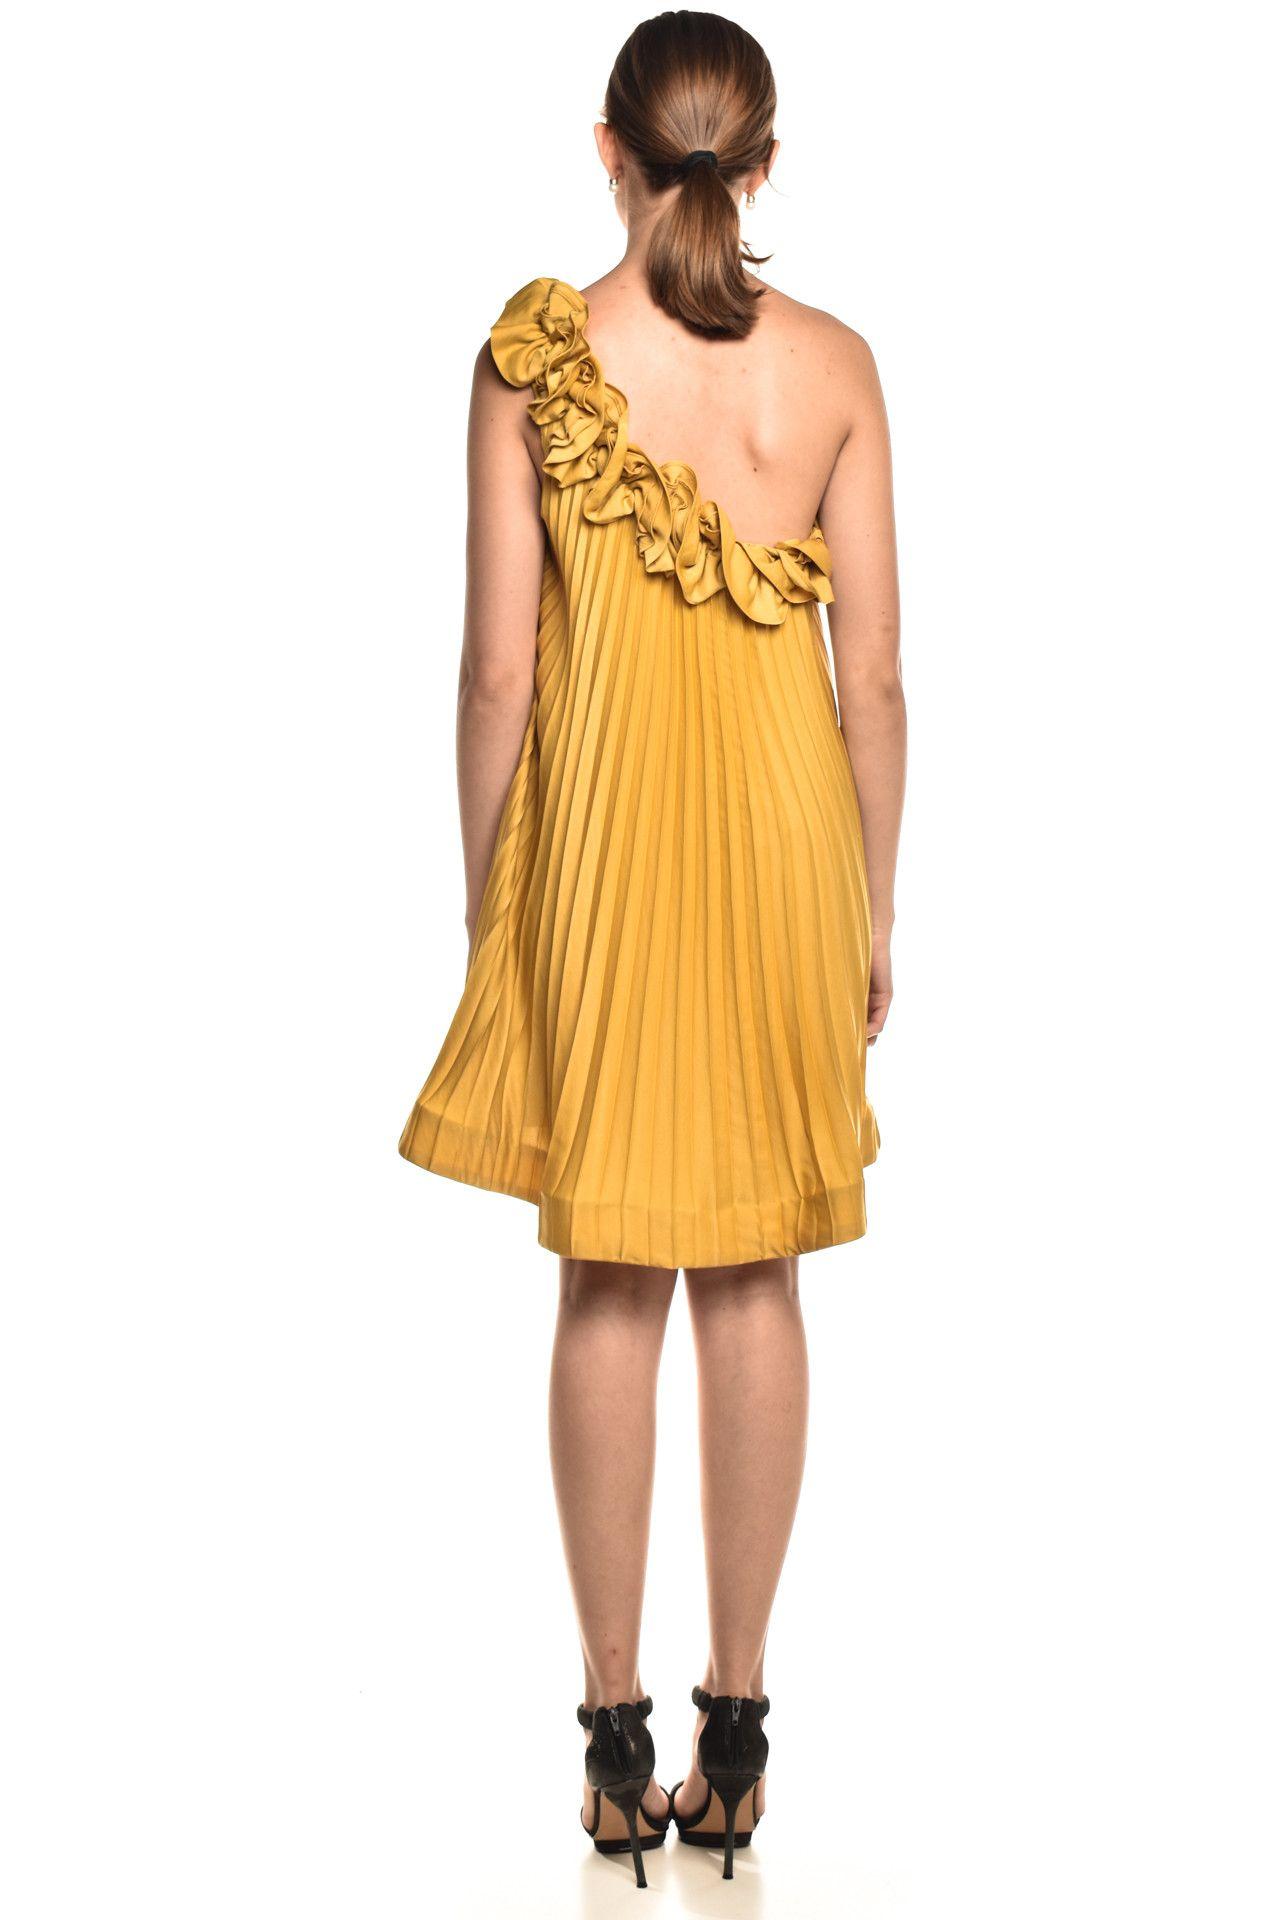 Bcbgmaxazria - Vestido Babados Yellow - Foto 5